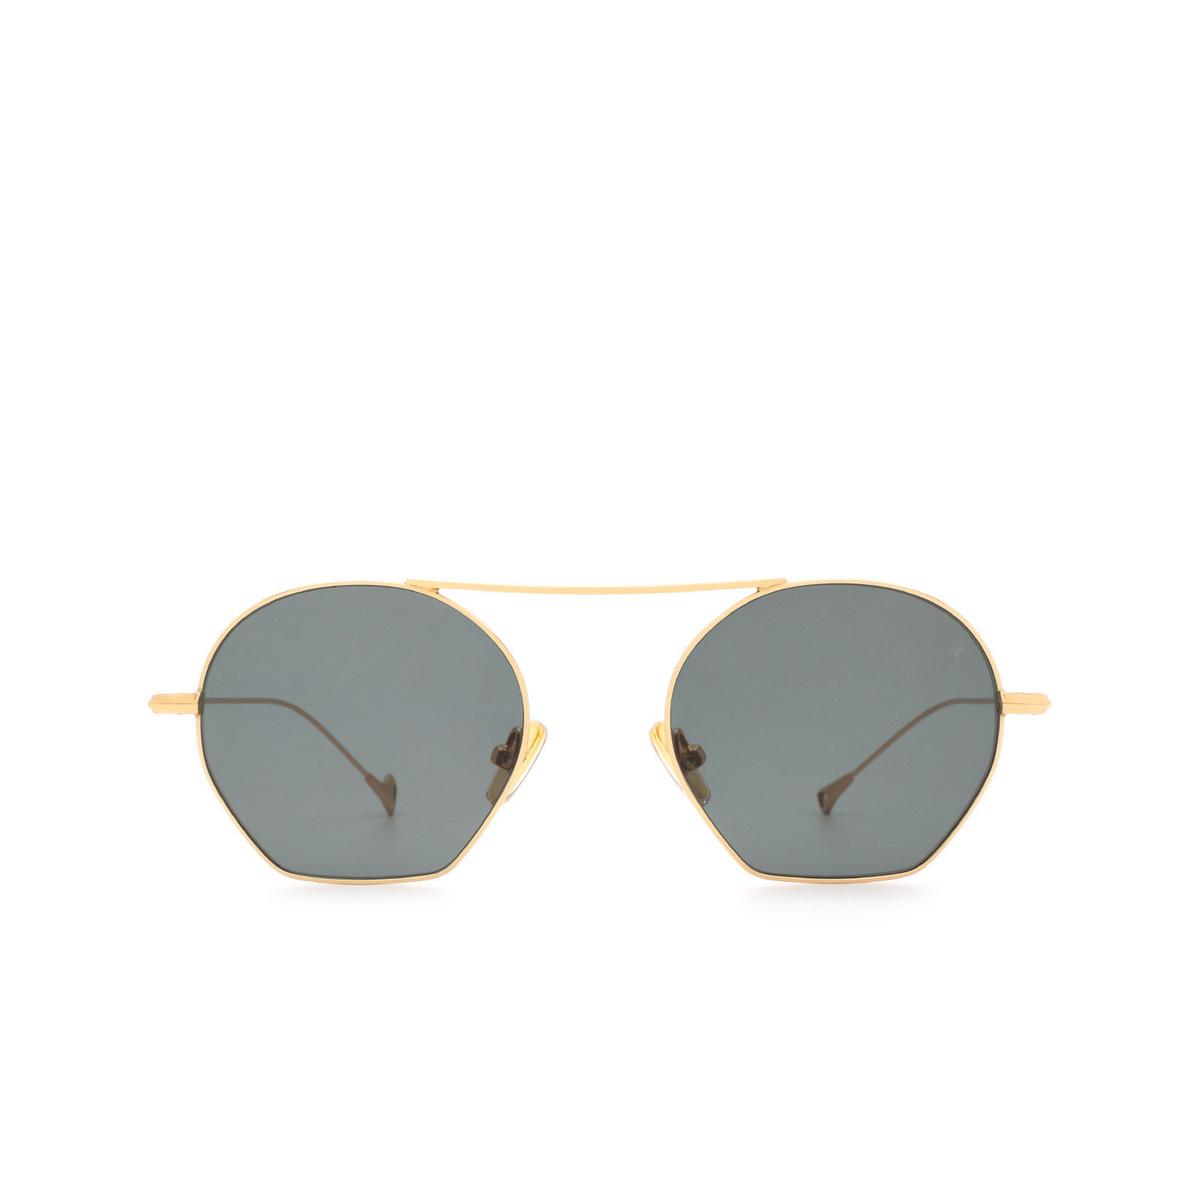 Eyepetizer® Irregular Sunglasses: Botafoch color Gold C.4-40 - front view.